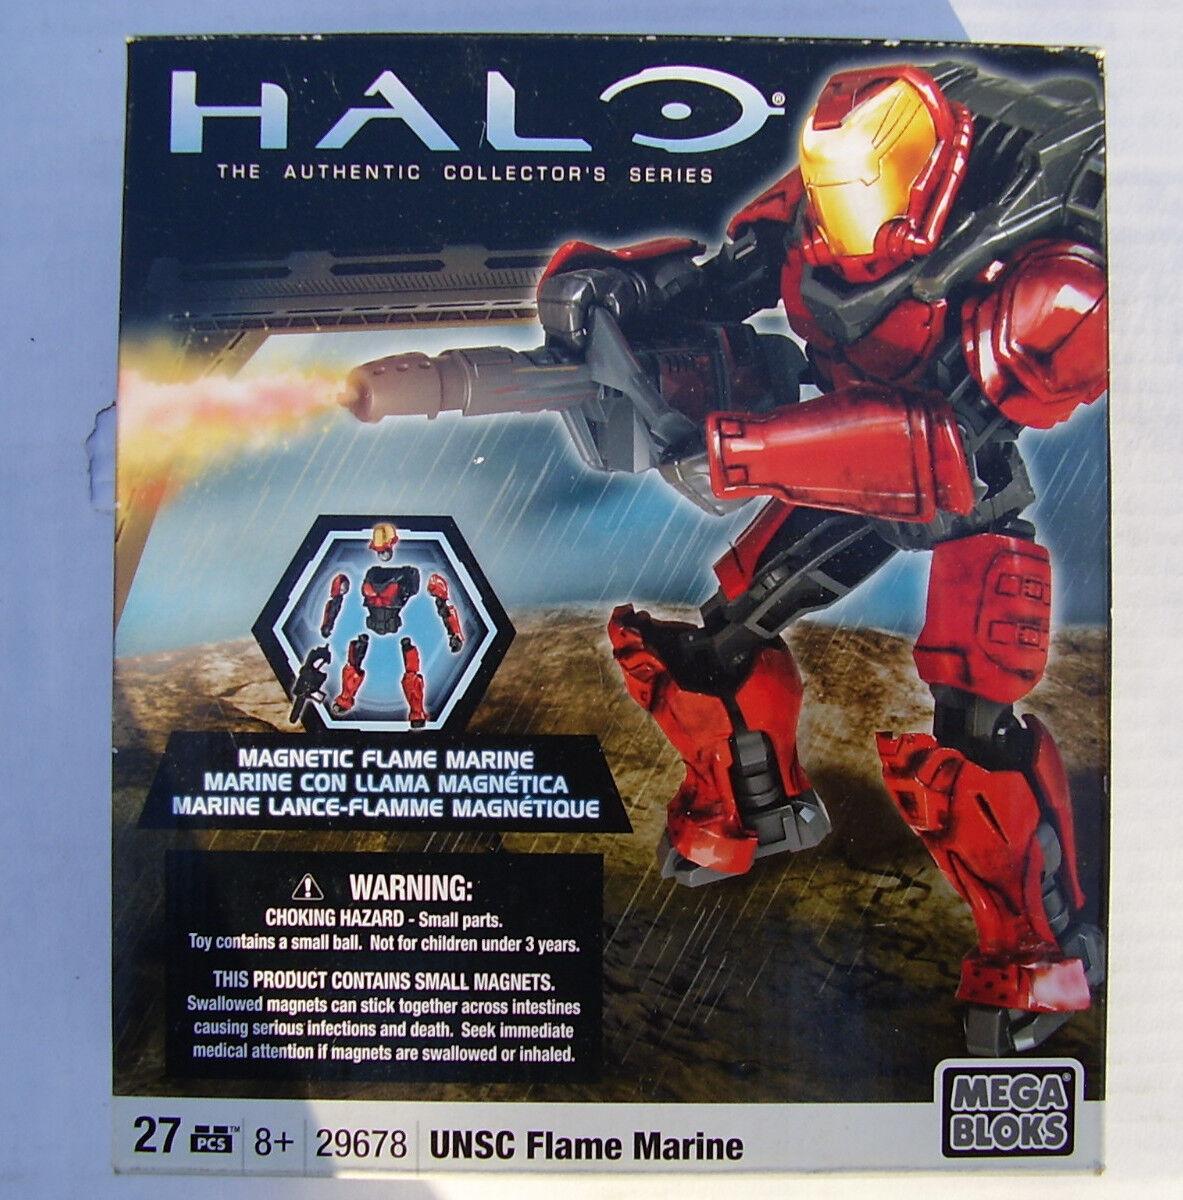 Magnetic UNSC Flame Marine Halo Authentic Bloks Collector Series Mega Bloks Authentic 29678 MI 06c03f